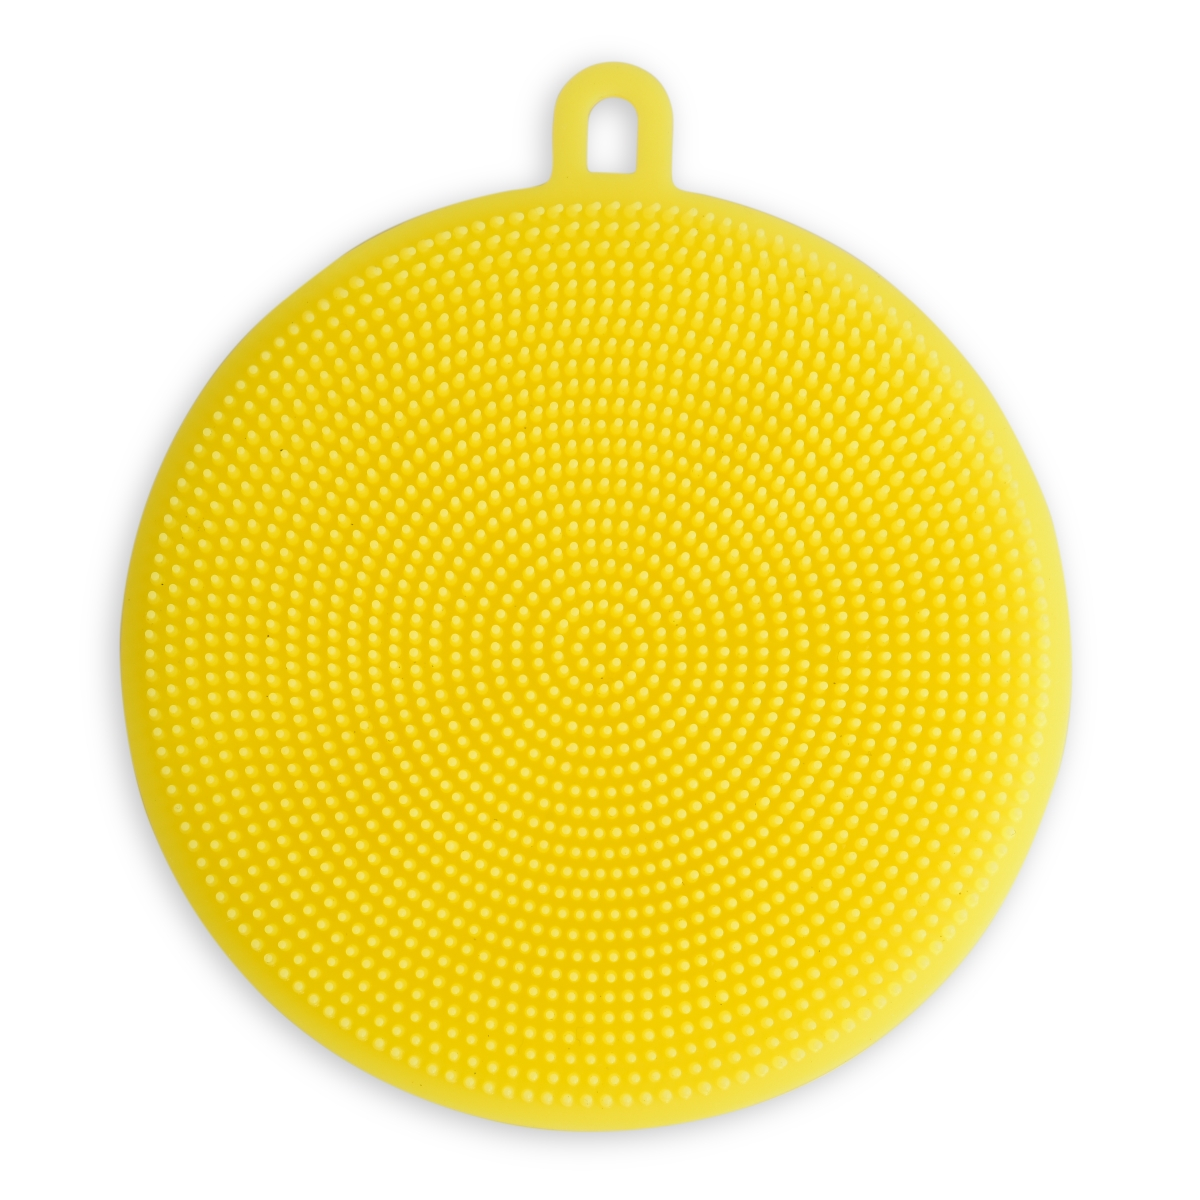 SILISASANKA na mytí silikonová houbička oboustranná, žlutá